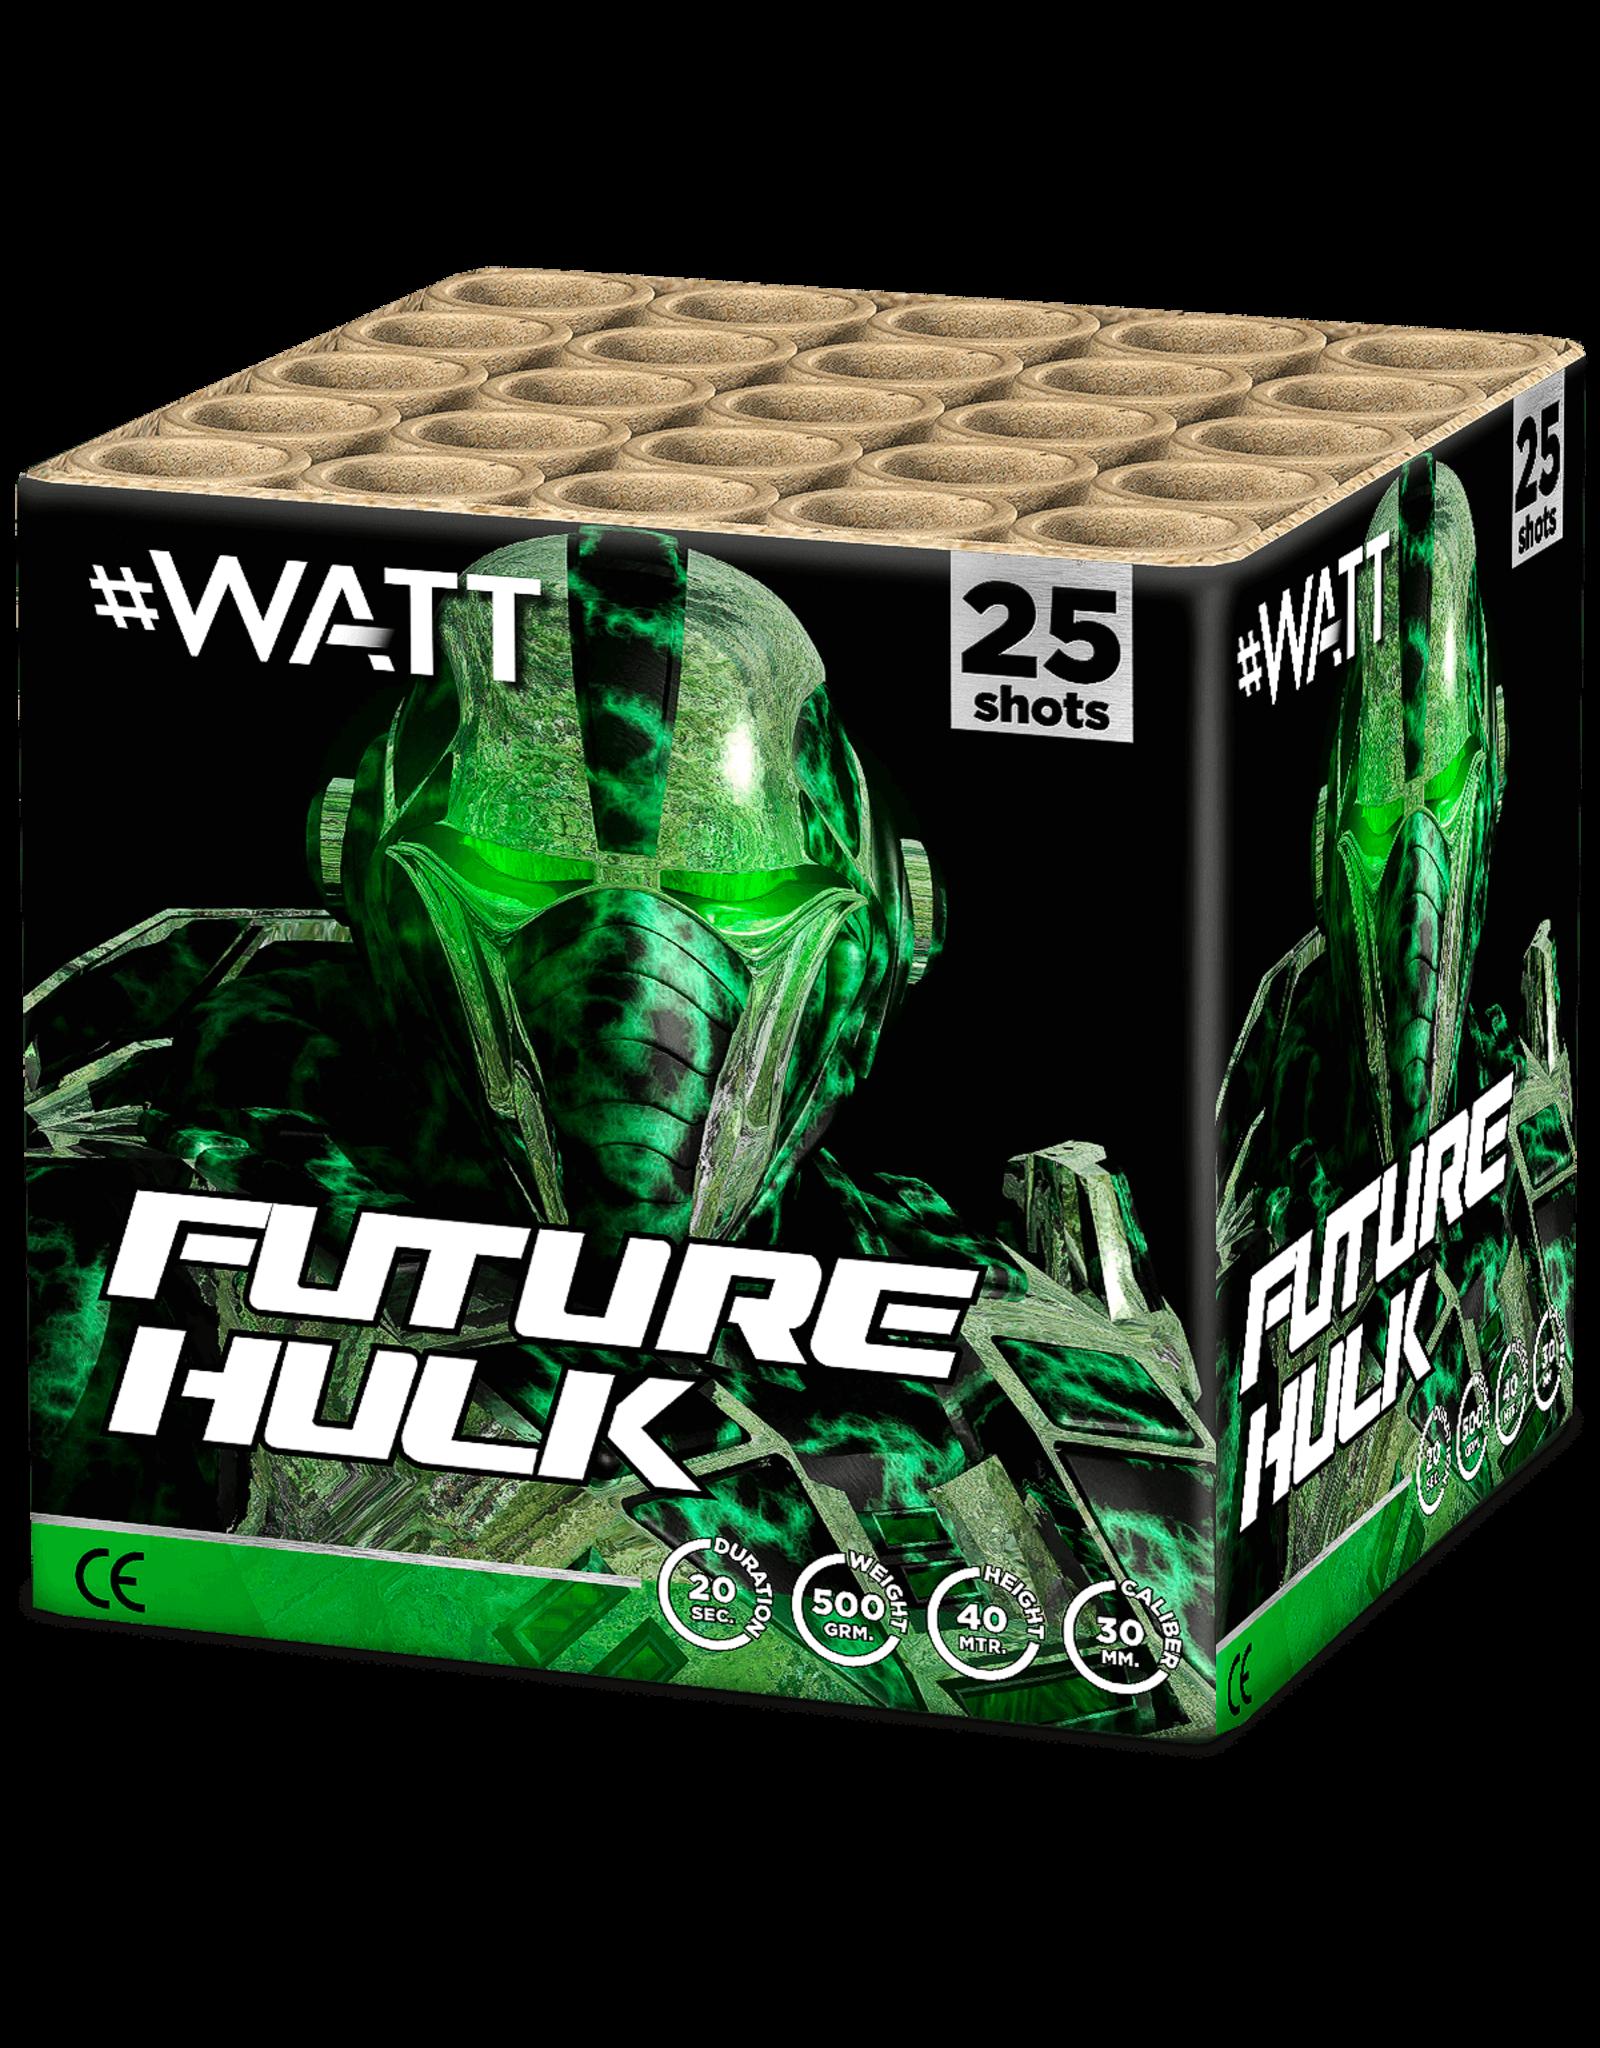 Volt! Future Hulk 25 shots